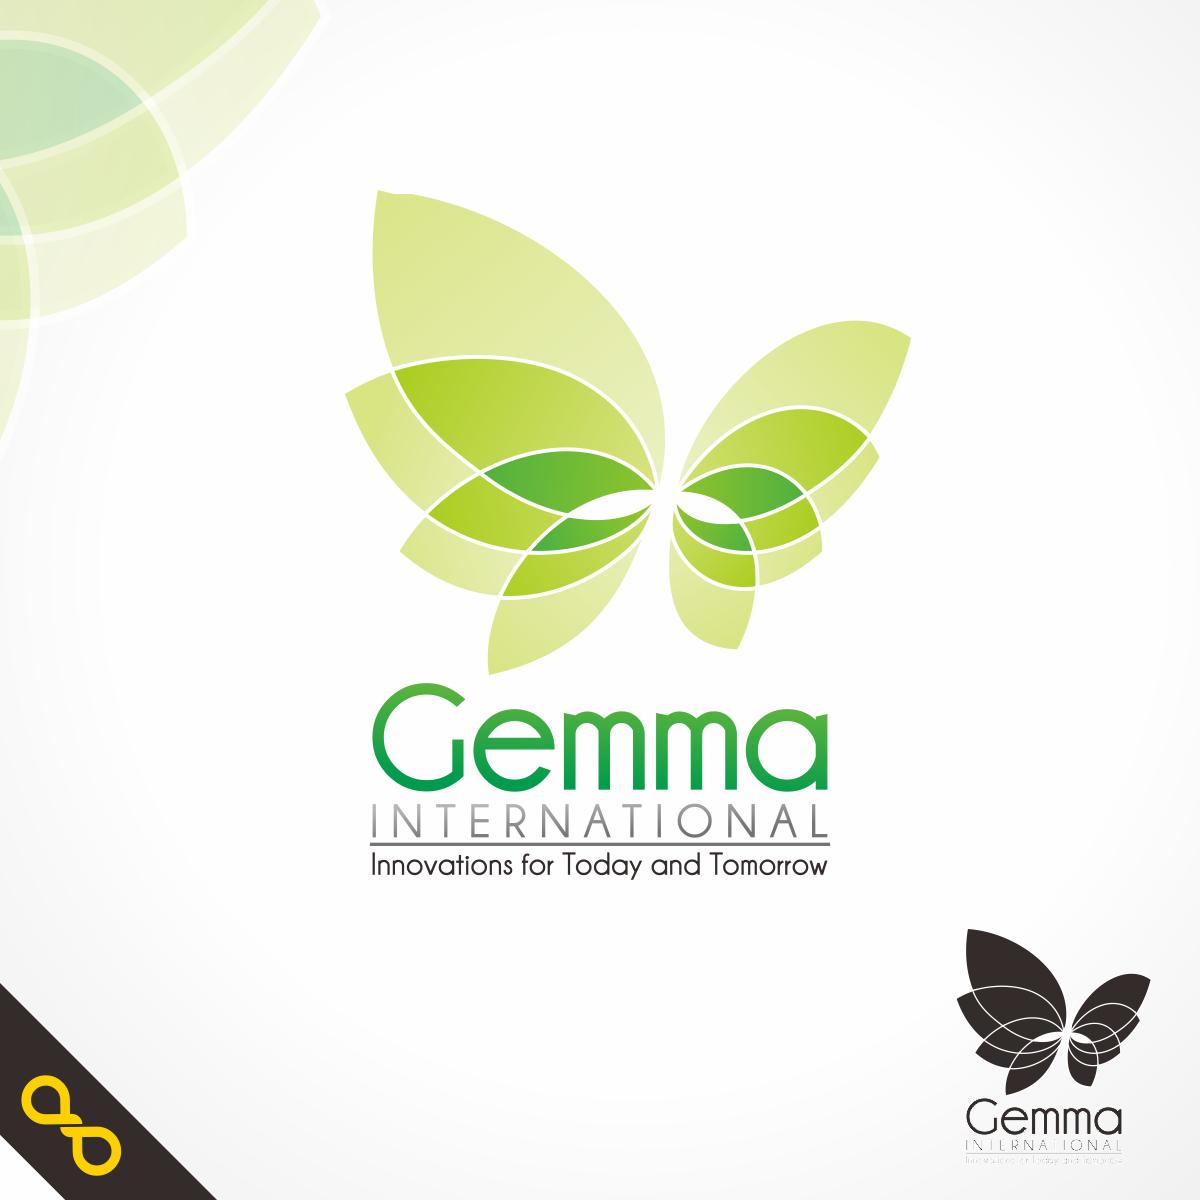 Logo Design by PJD - Entry No. 20 in the Logo Design Contest Artistic Logo Design for Gemma International.